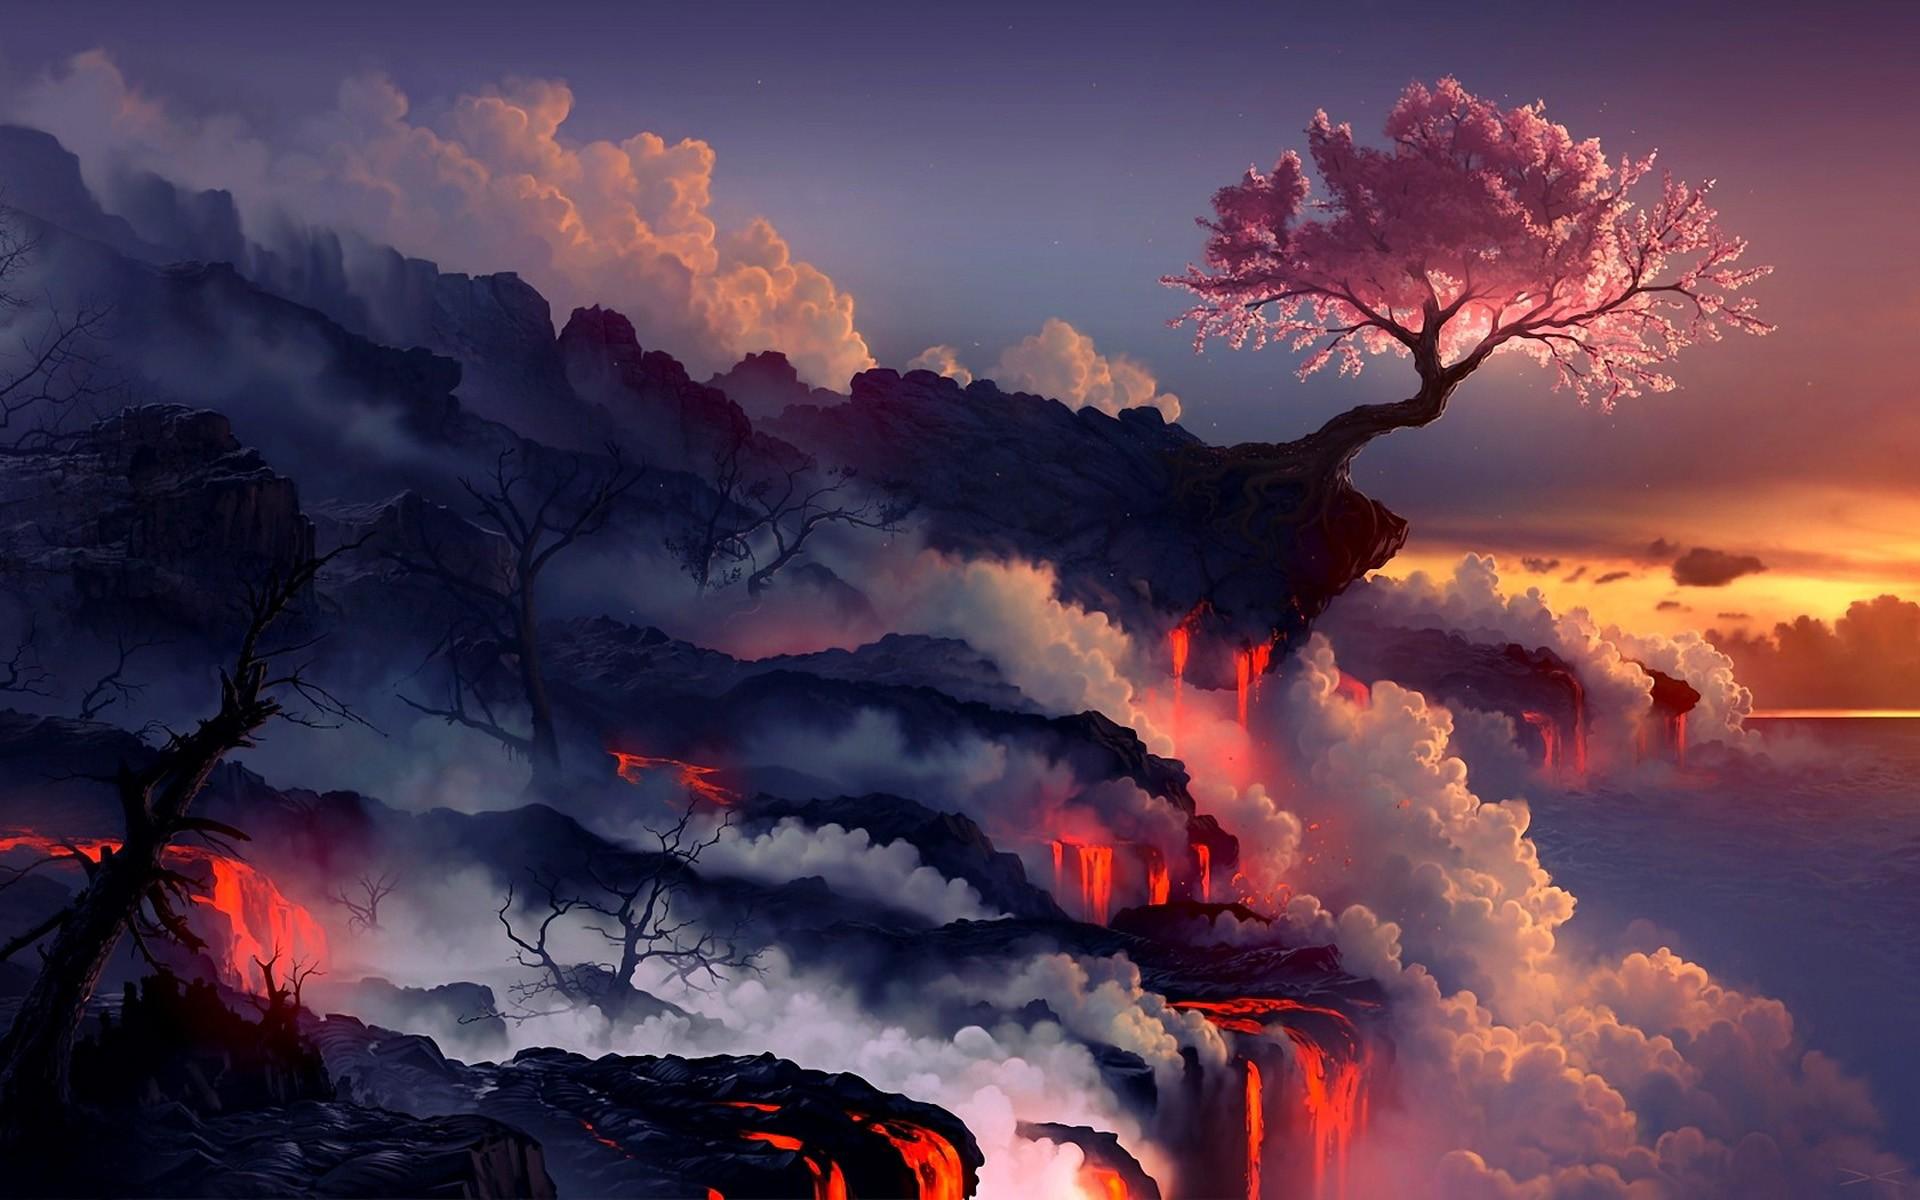 Landscapes-cherry-blossoms-trees-sea-lava-smoke-rocks-artwork-drawings-wallpaper.